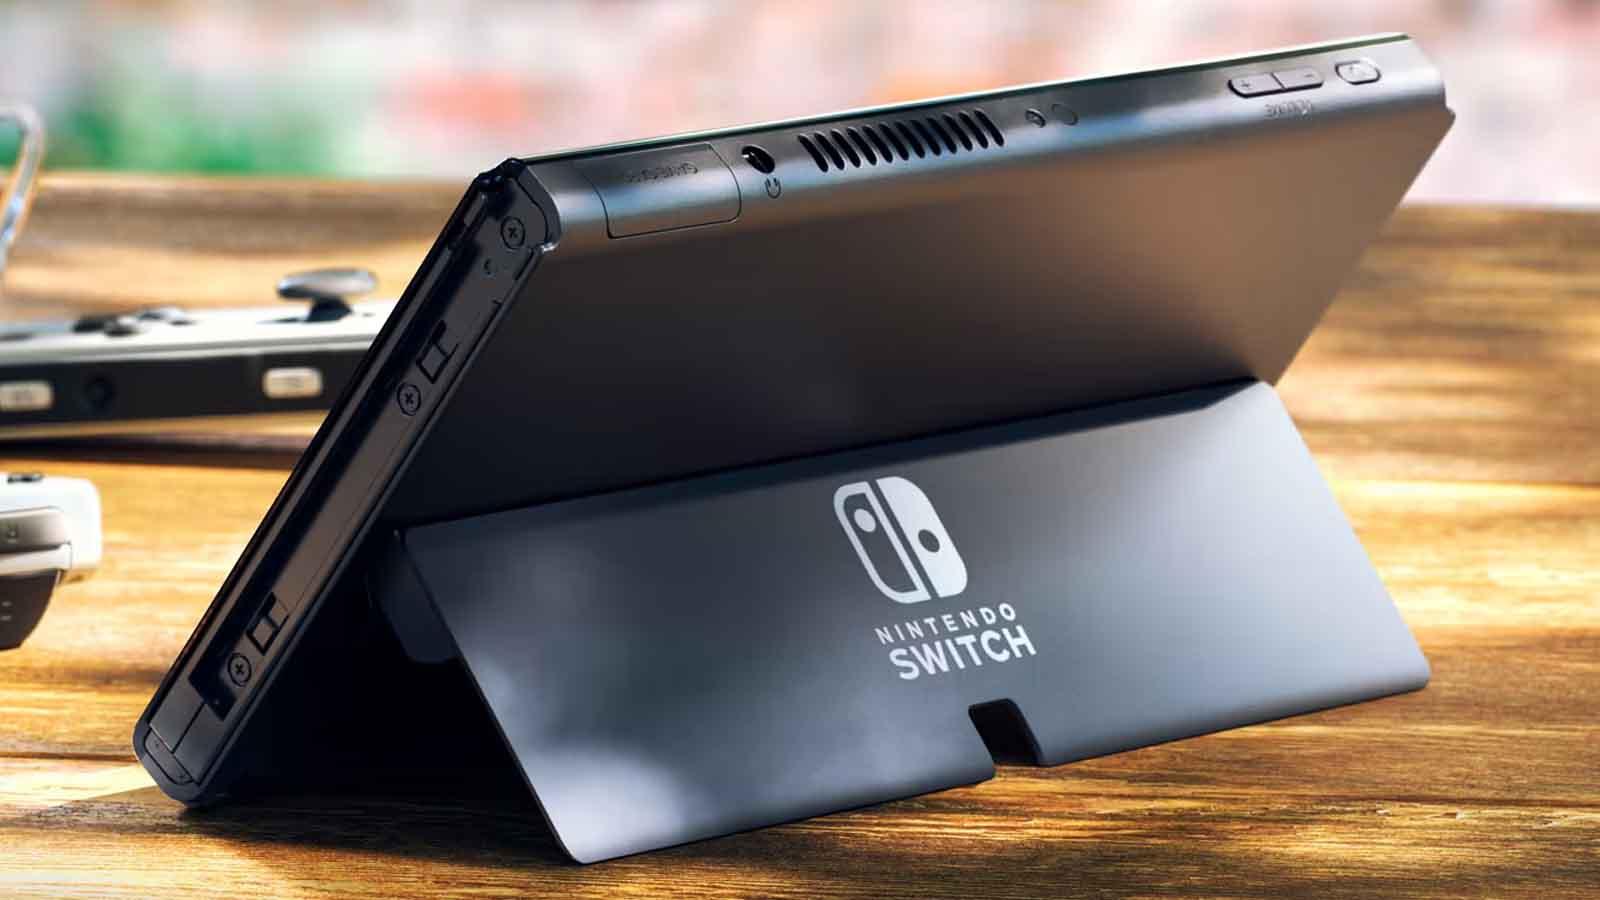 nintendo switch oled sd card